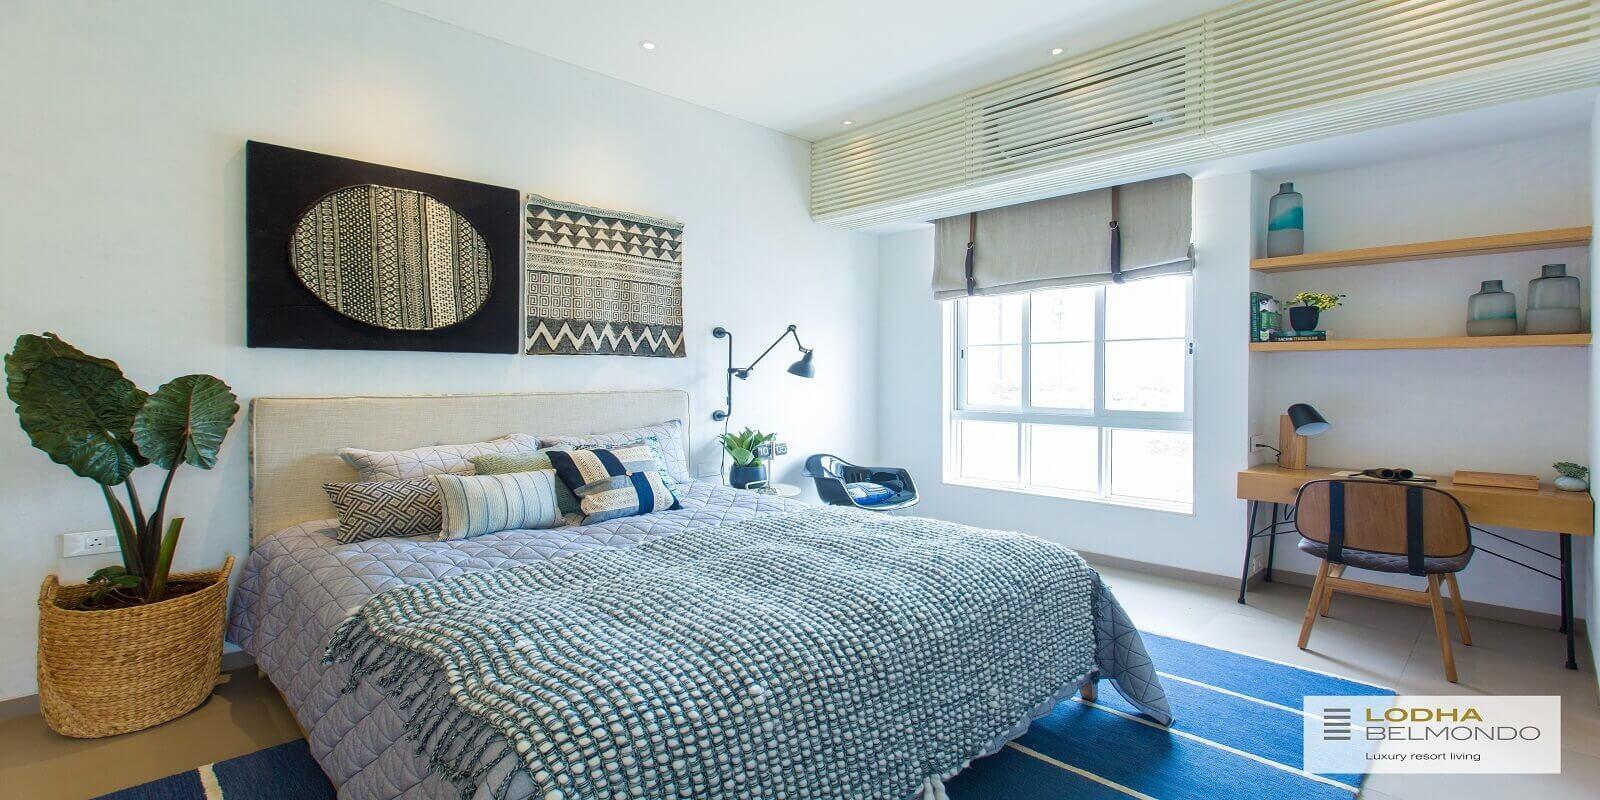 lodha belmondo apartment interiors1